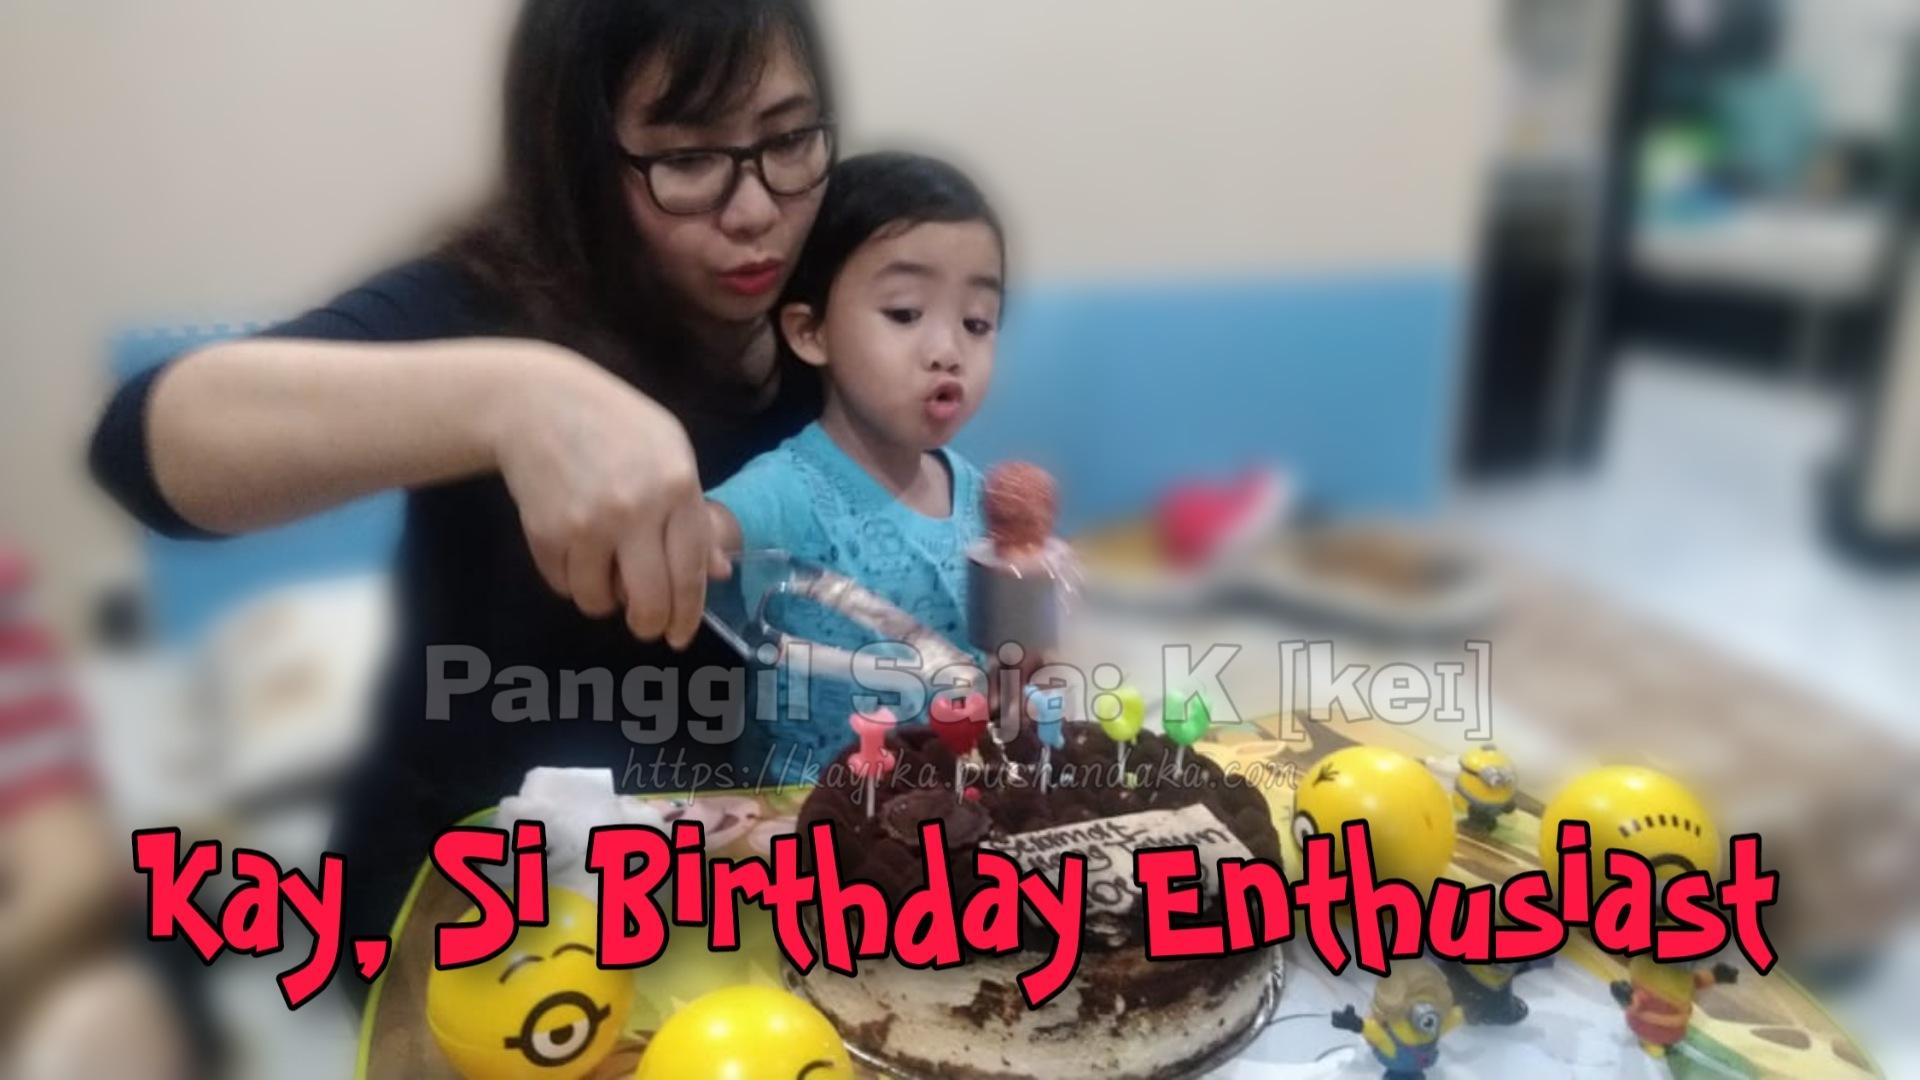 Gaya K merayakan ulang tahun